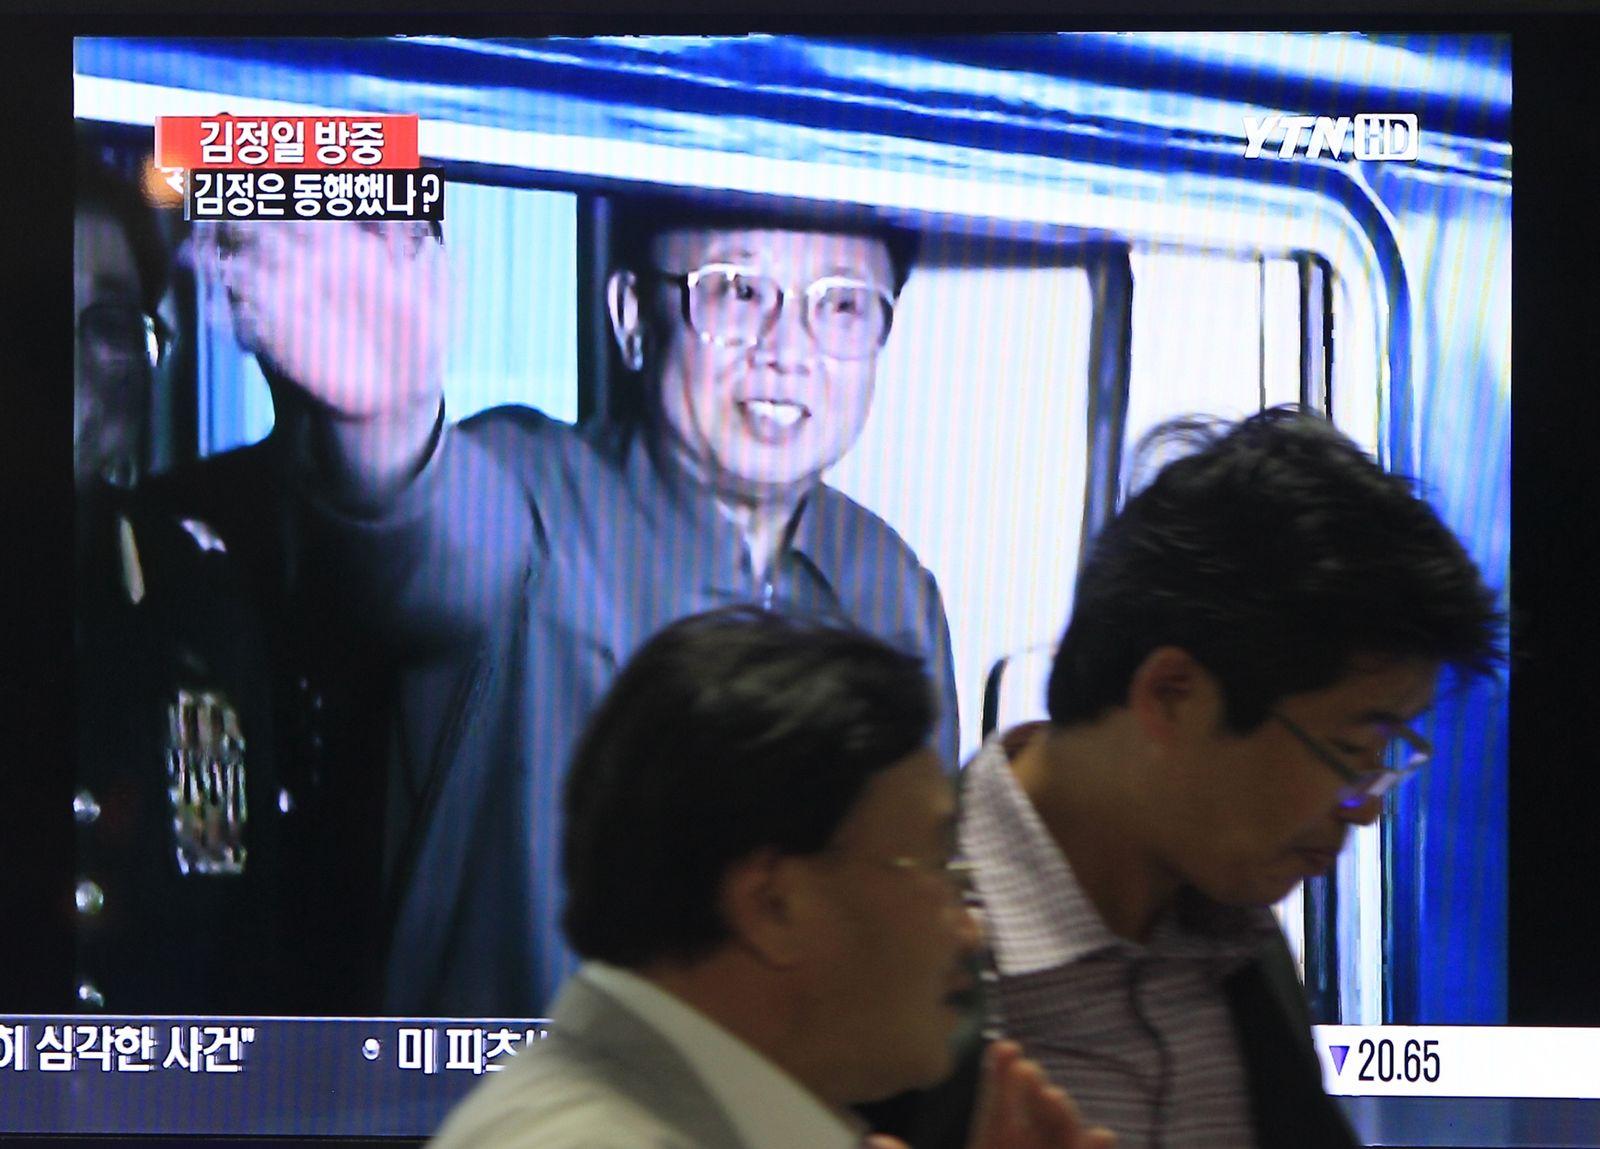 South Korea North Korea China Kim Jong Il